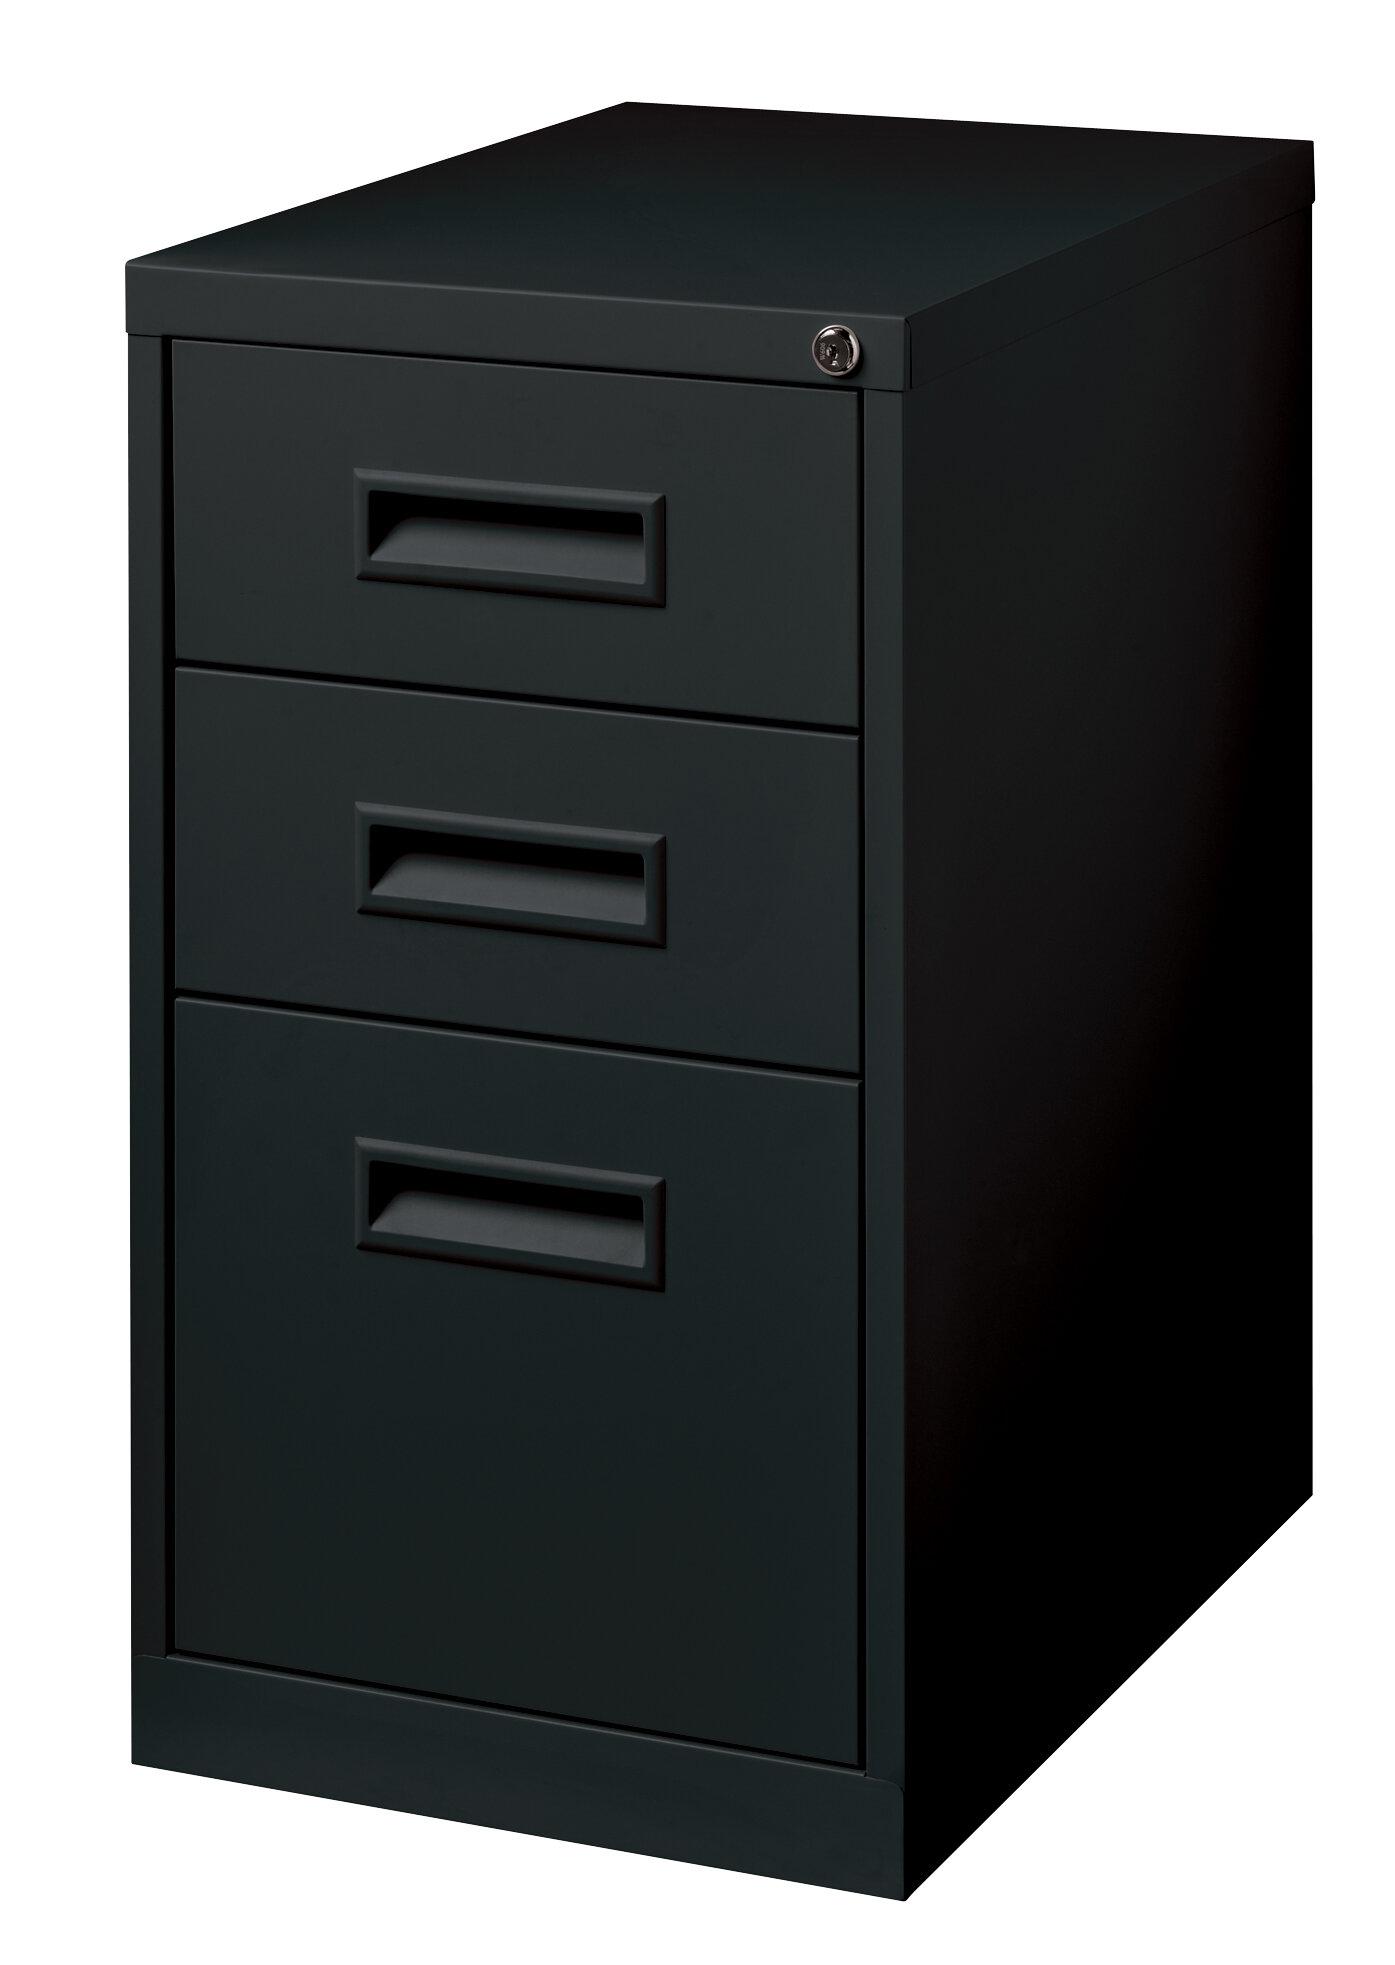 Commclad 3 Drawer Mobile Vertical Filing Cabinet Reviews Wayfair